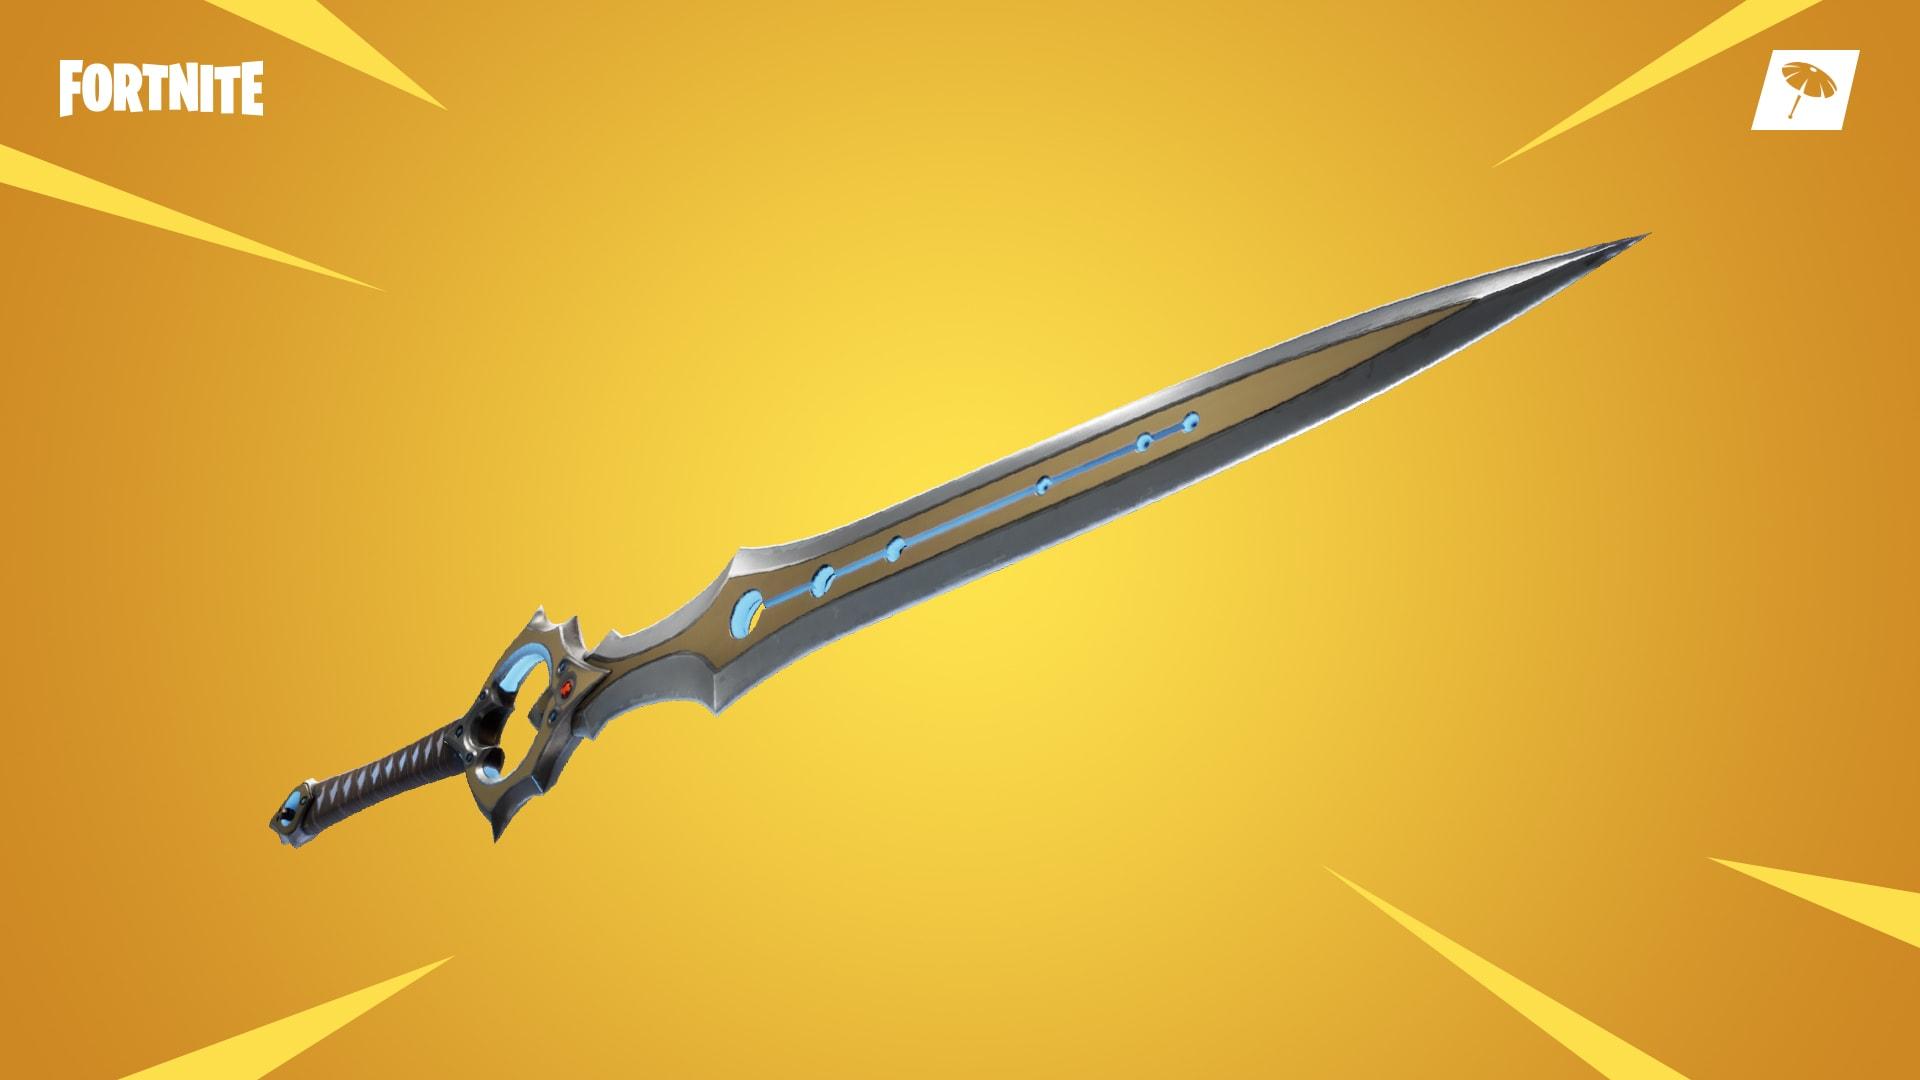 Fortnite Infitnity Blade